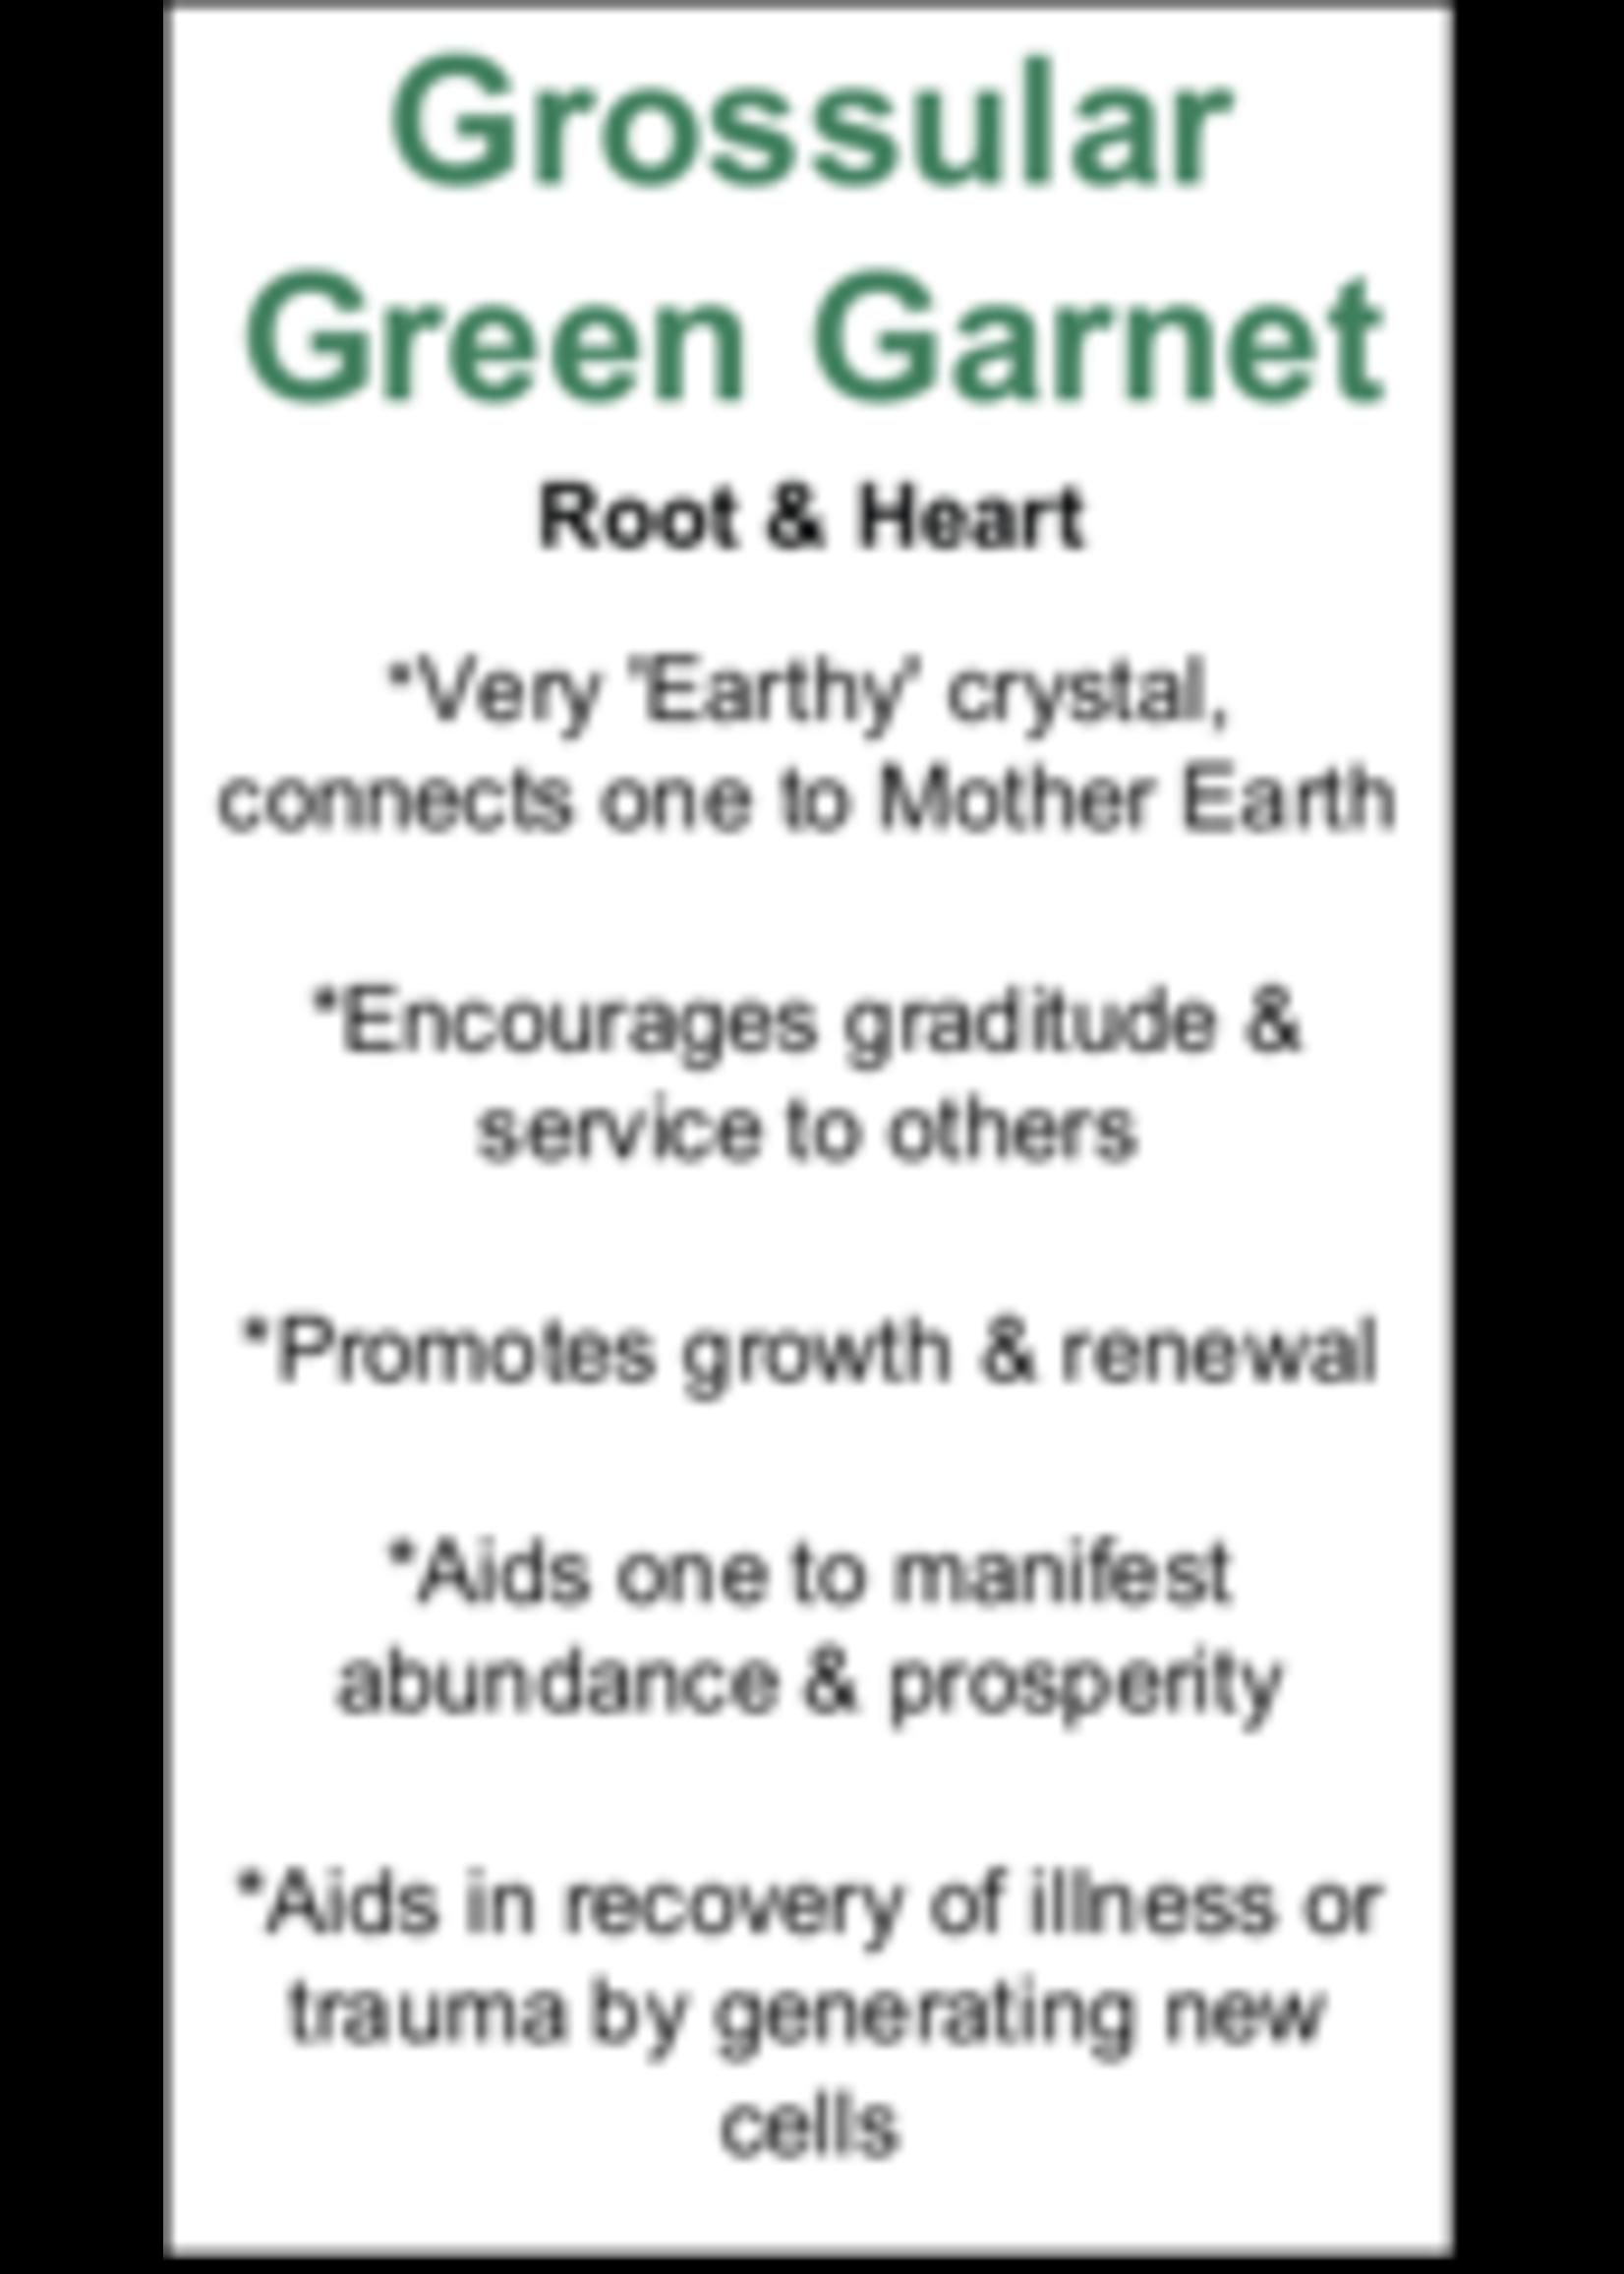 Grossular Green Garnet Cards - Box of 250